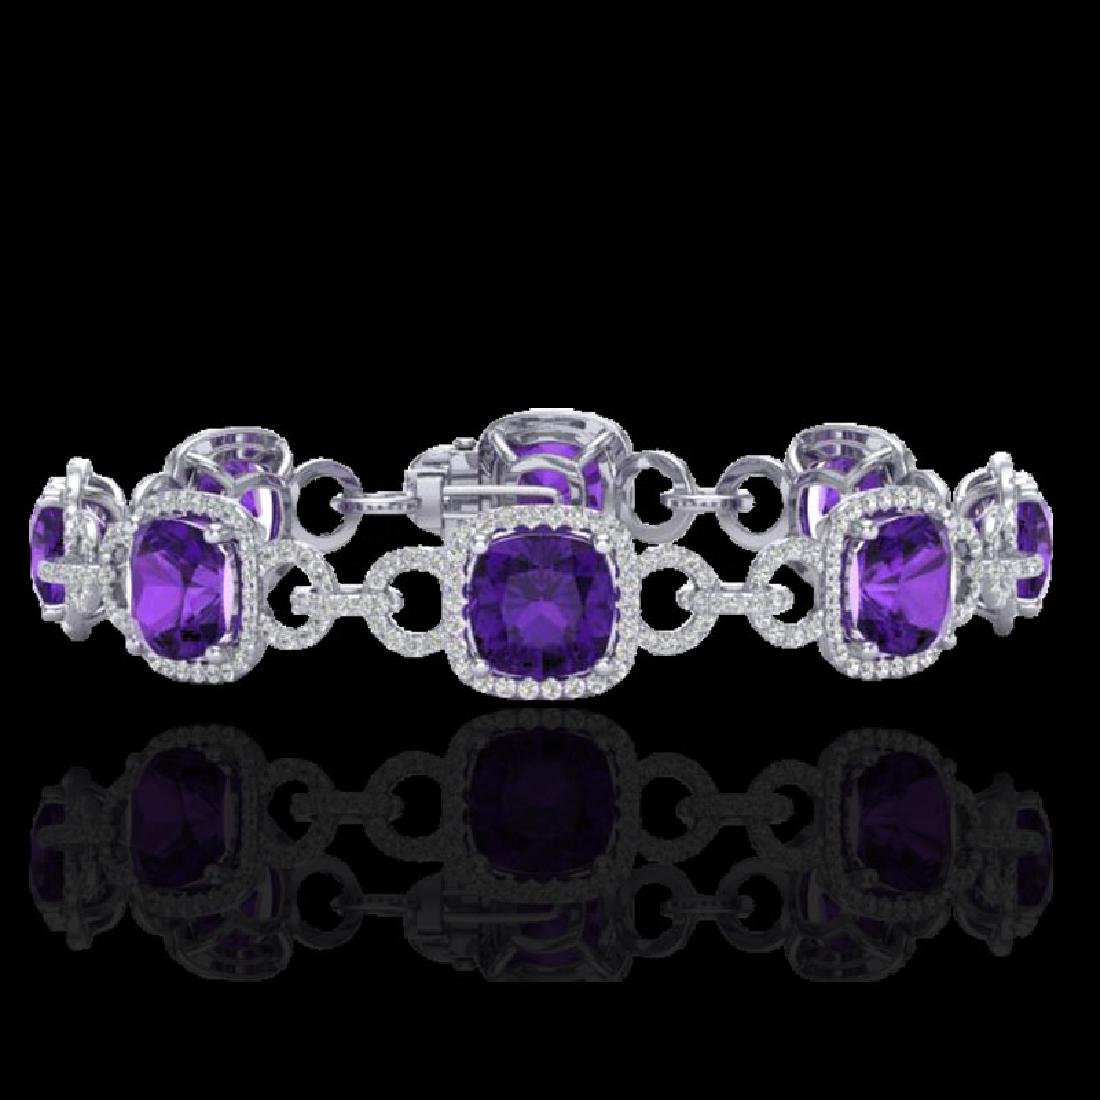 30 CTW Amethyst & Micro VS/SI Diamond Bracelet 14K